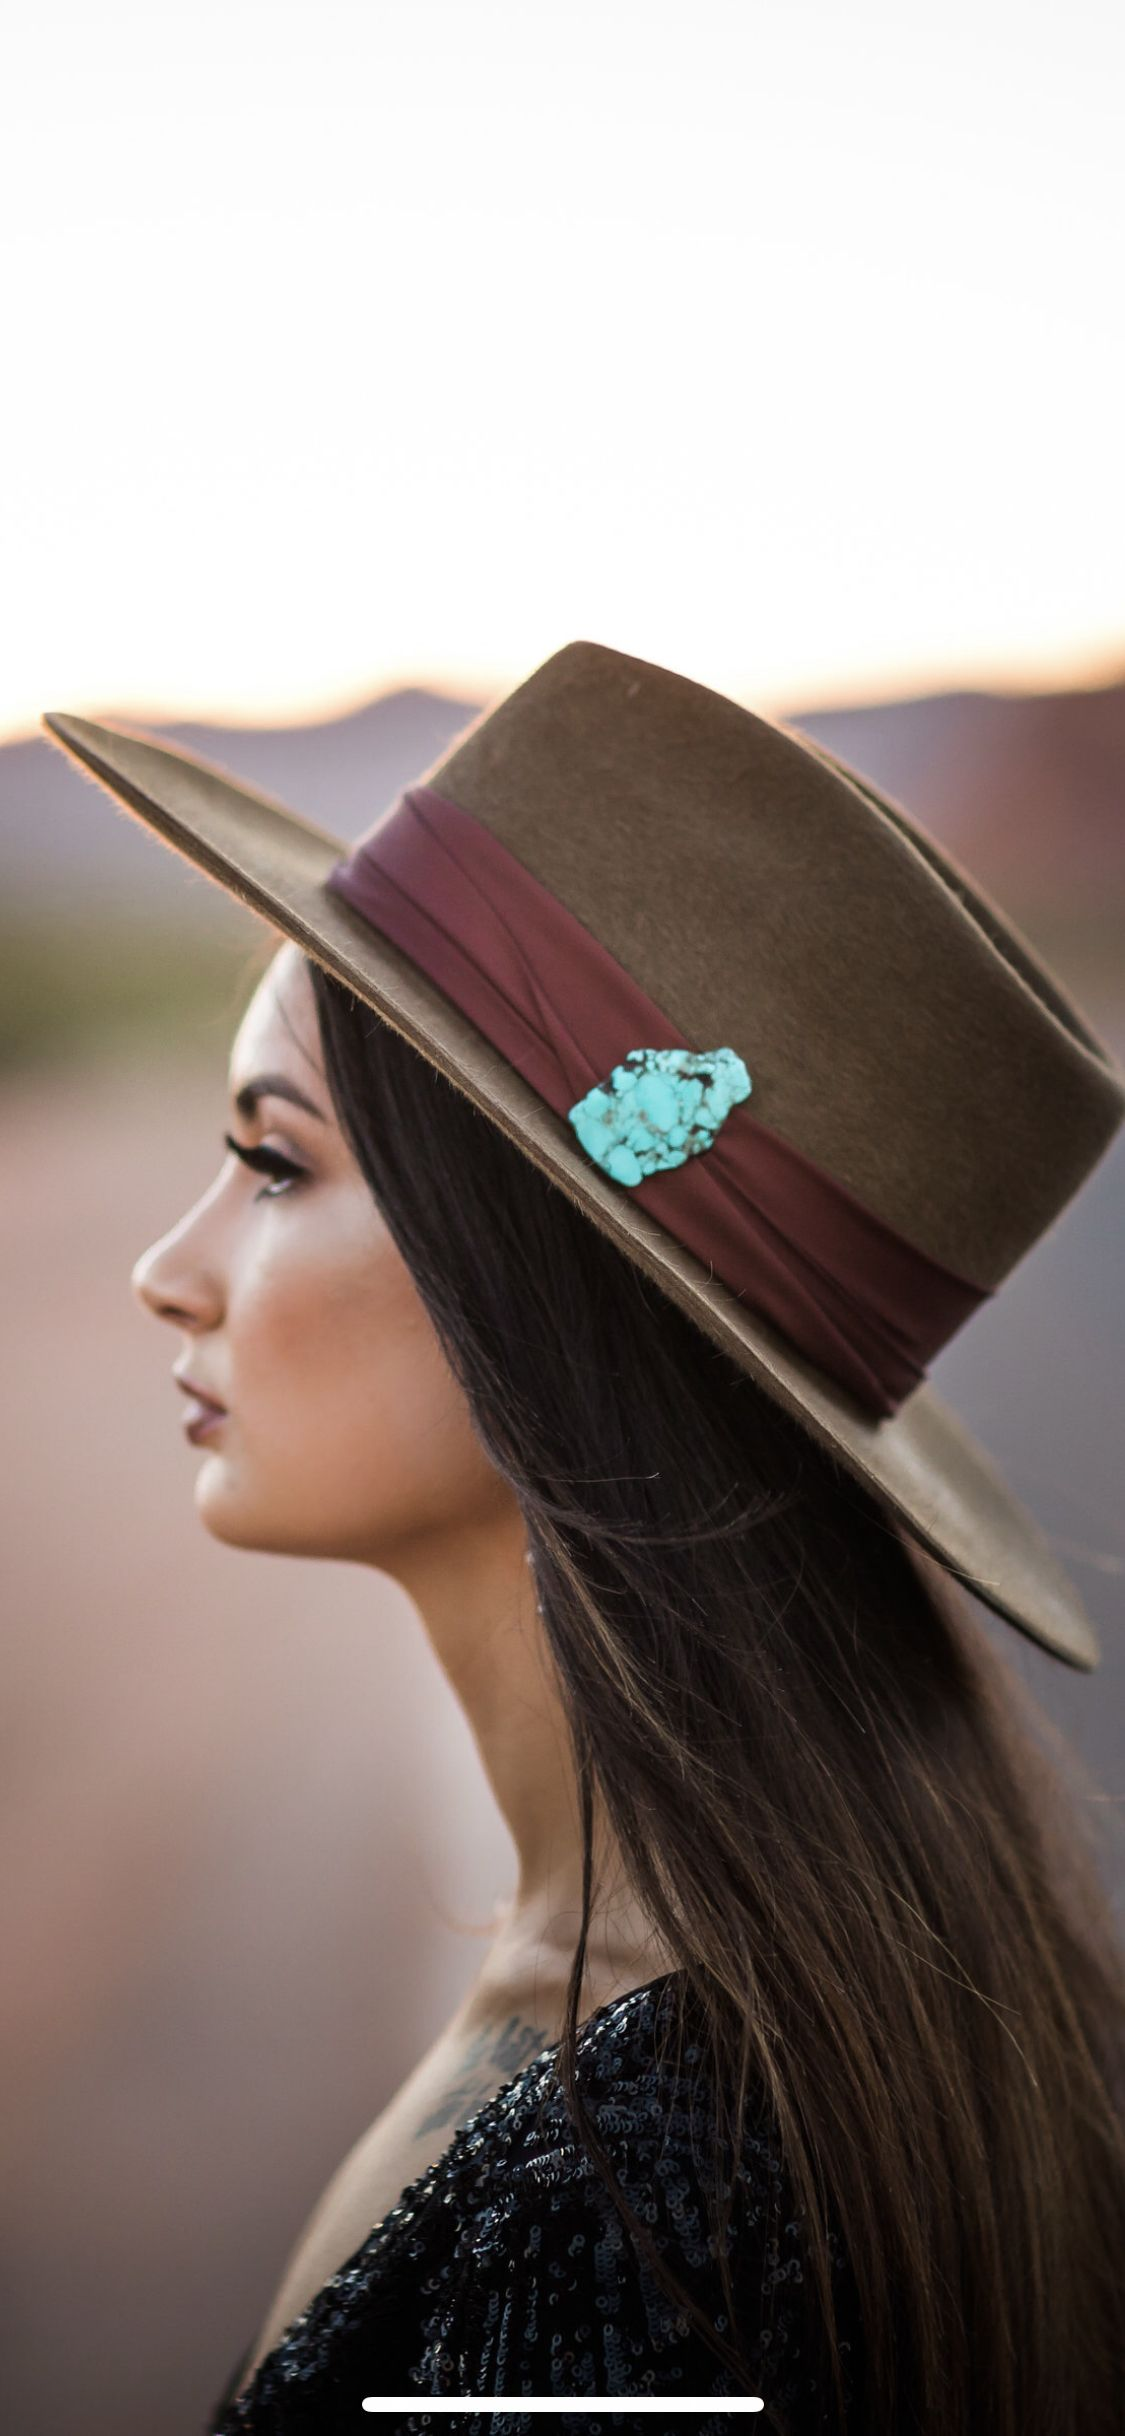 e6f0e9606d4e2b Western fashion, cowboy hat, turquoise jewelry, squash blossom, Louis  Vuitton, beadwork